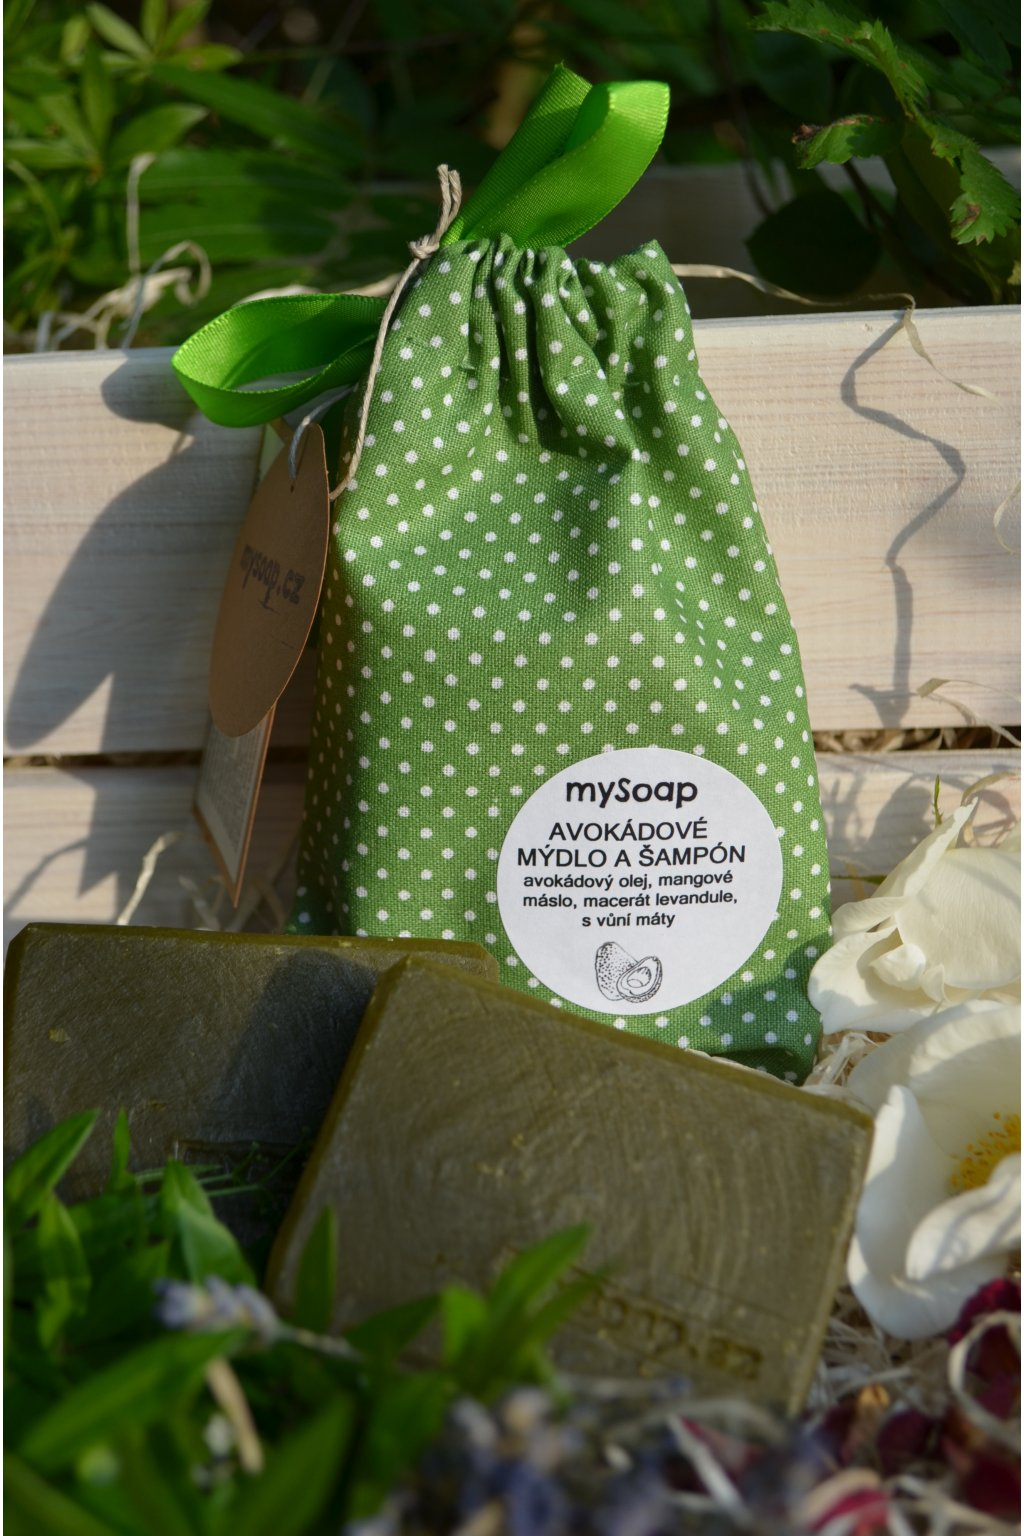 Avokádové mýdlo a šampón látkový pytlíček